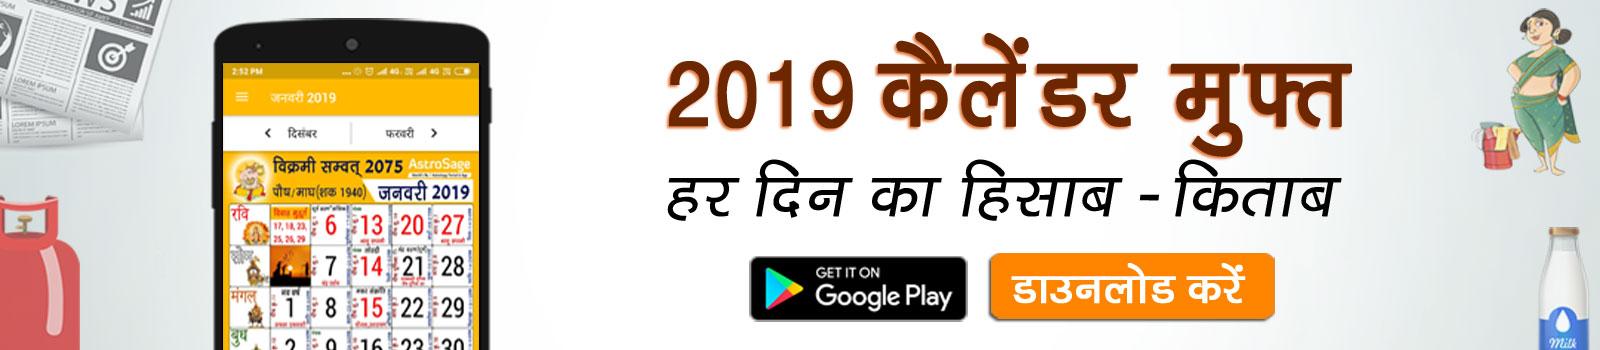 2019 Calendar App